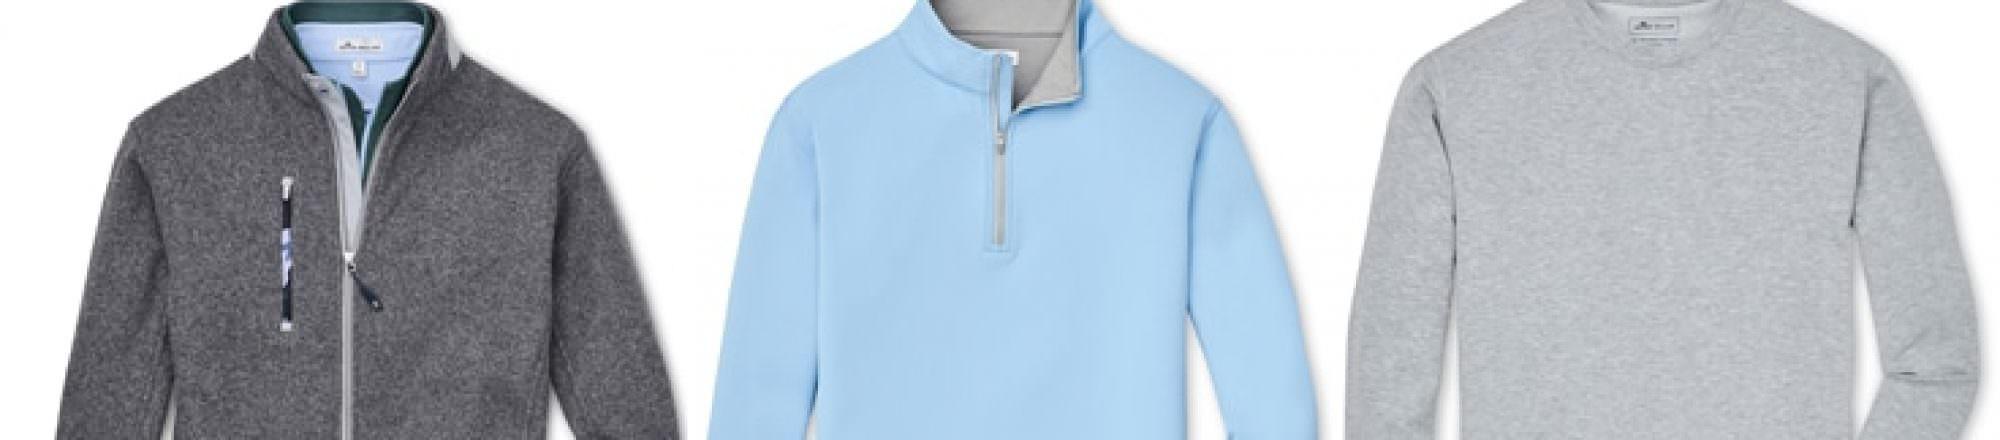 WIN: New Peter Millar apparel